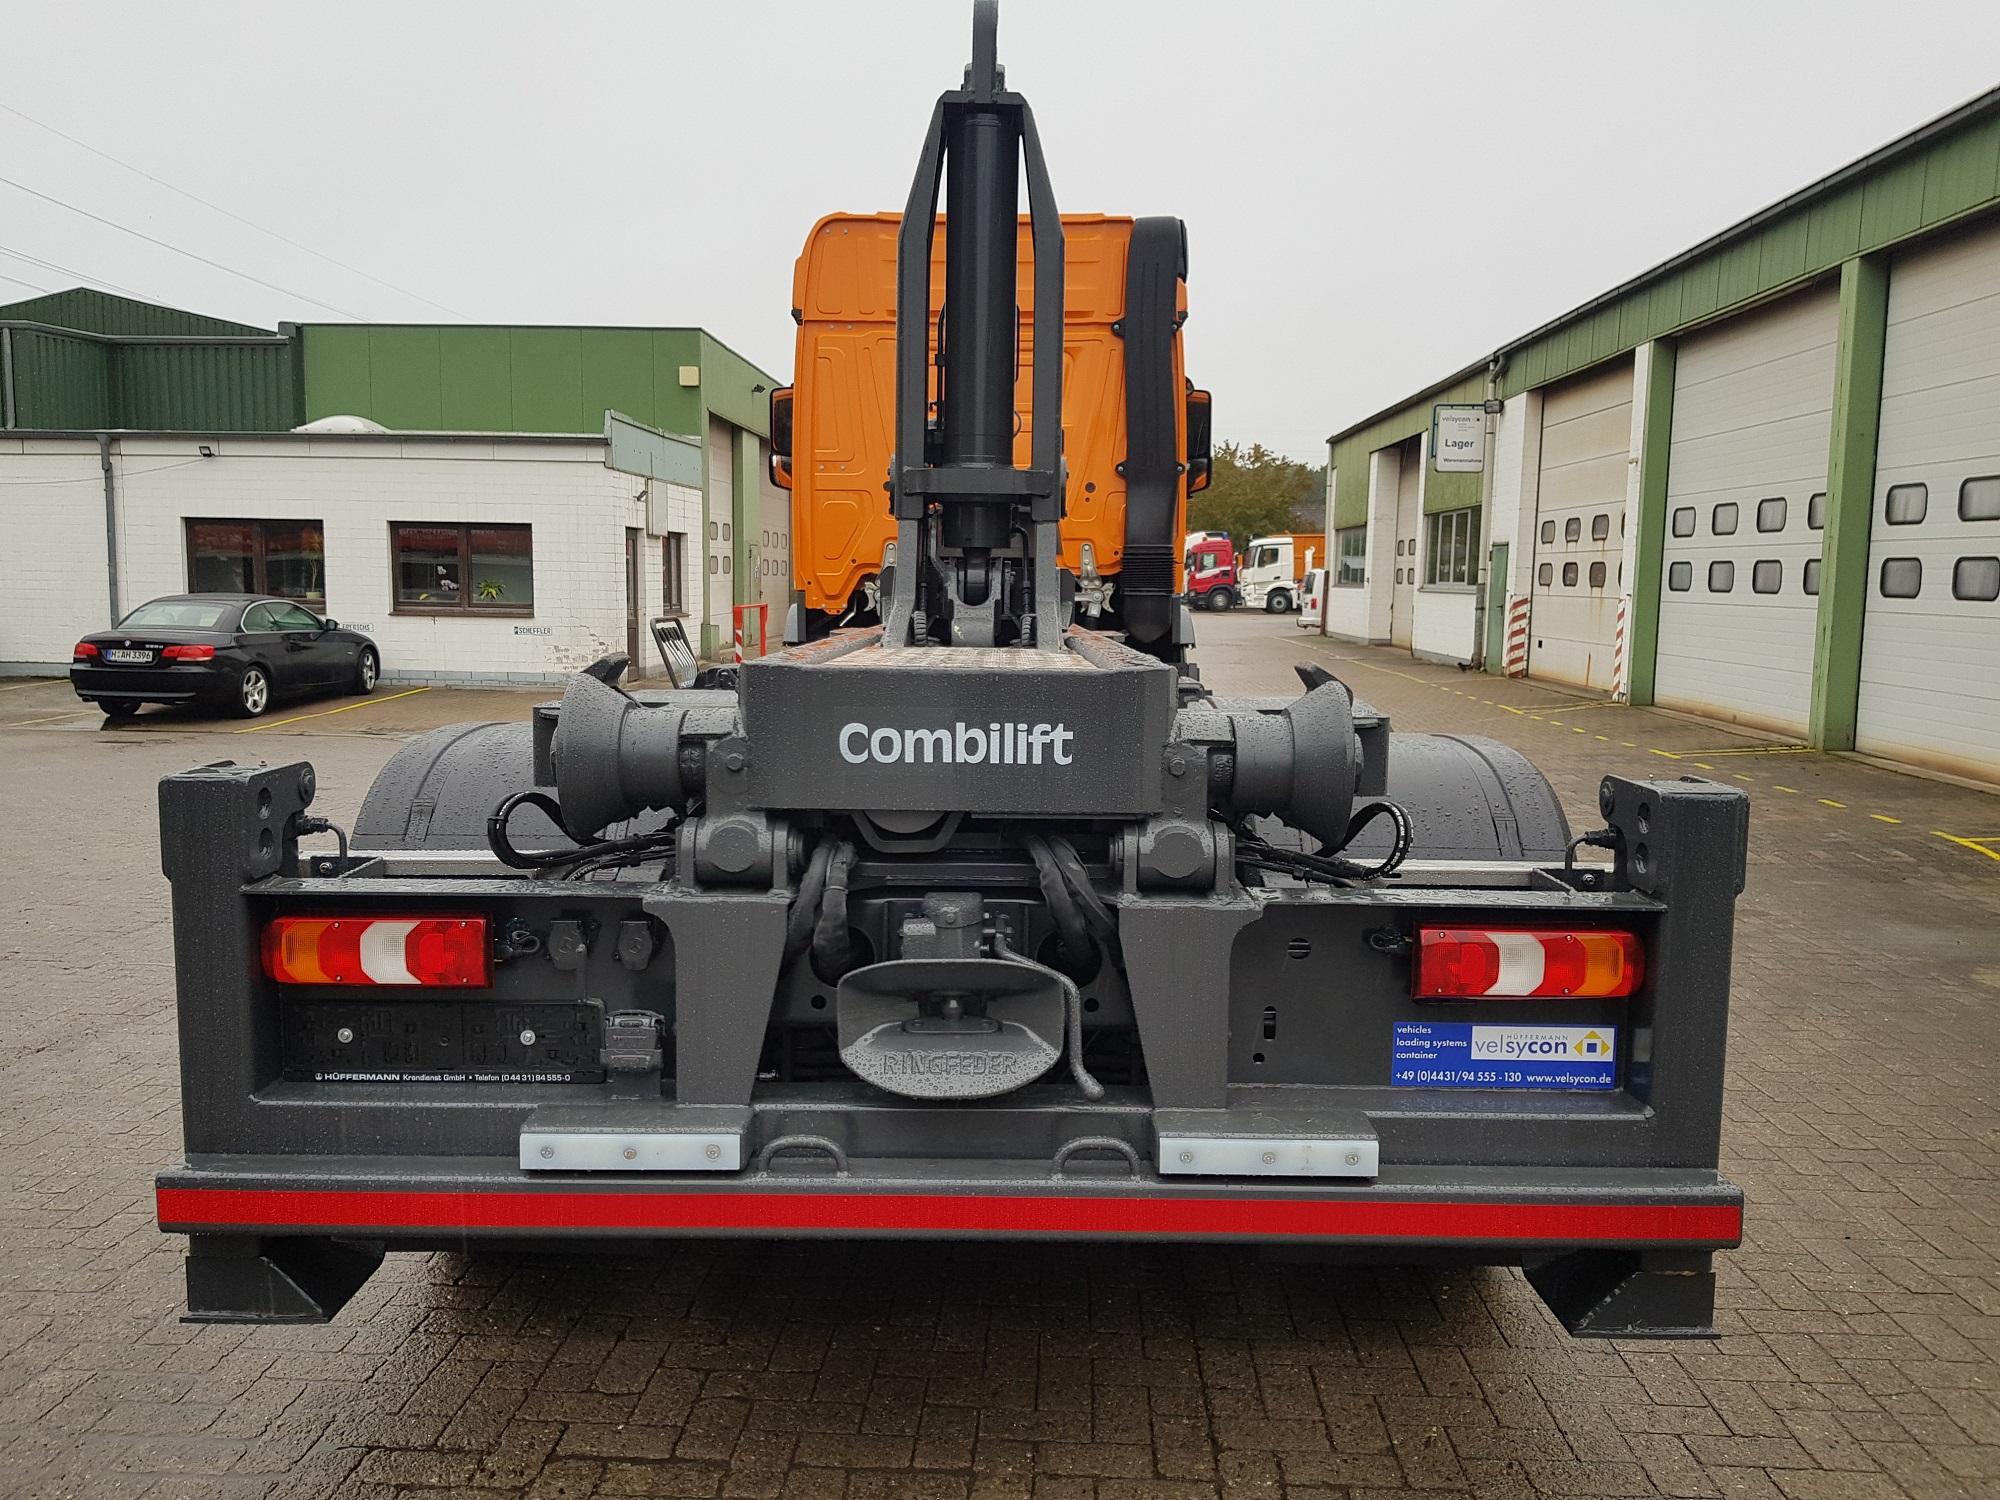 Combilift-Wechselsysteme-Thüringen-velsycon